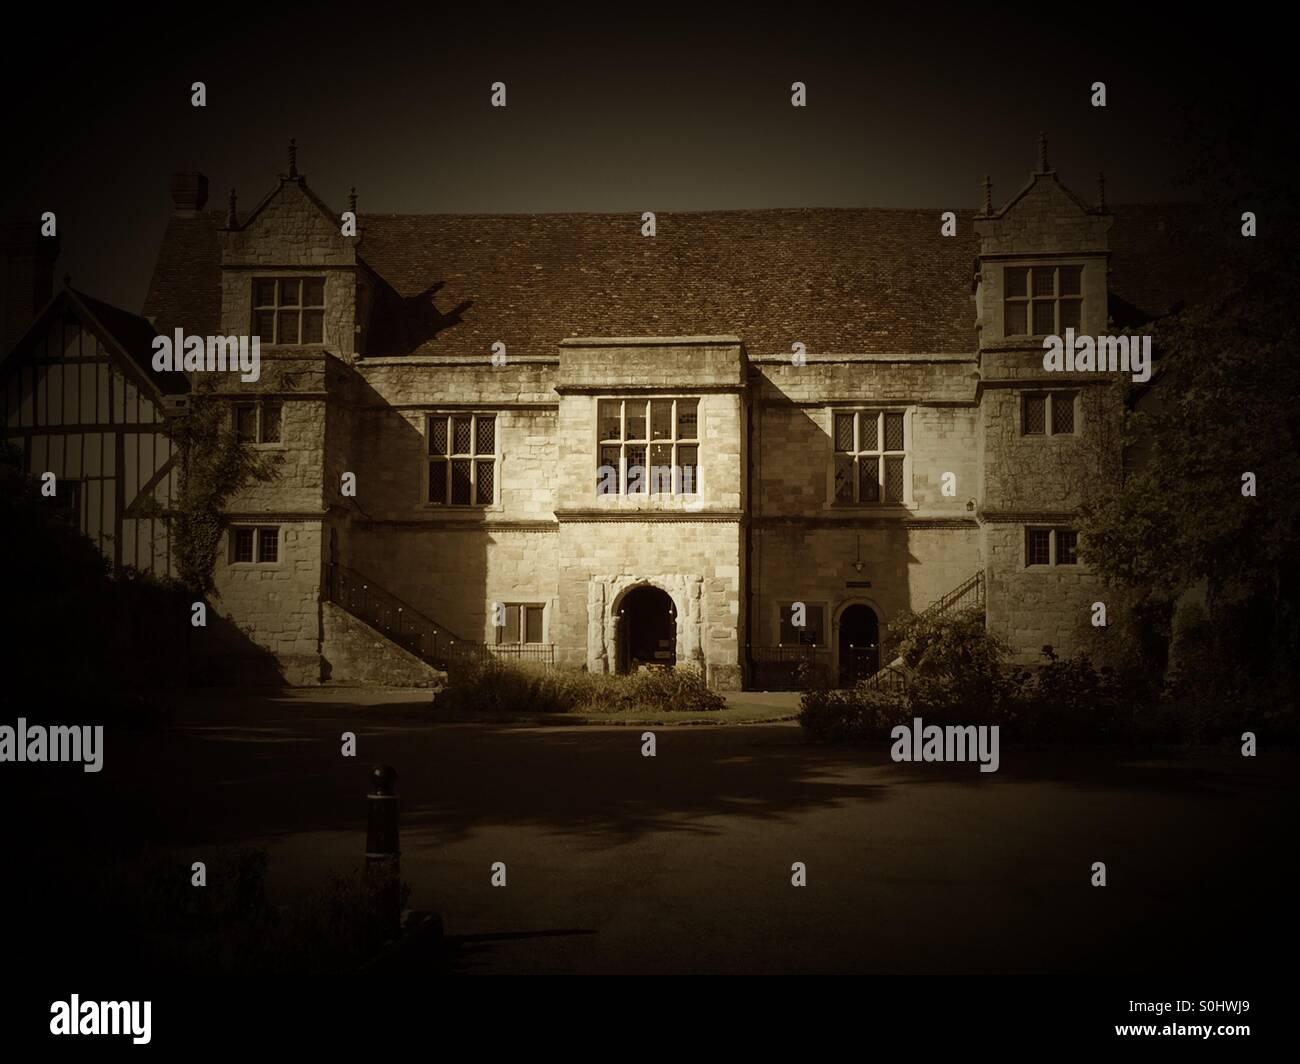 Archbishops Palace Maidstone Kent with sepia tones - Stock Image